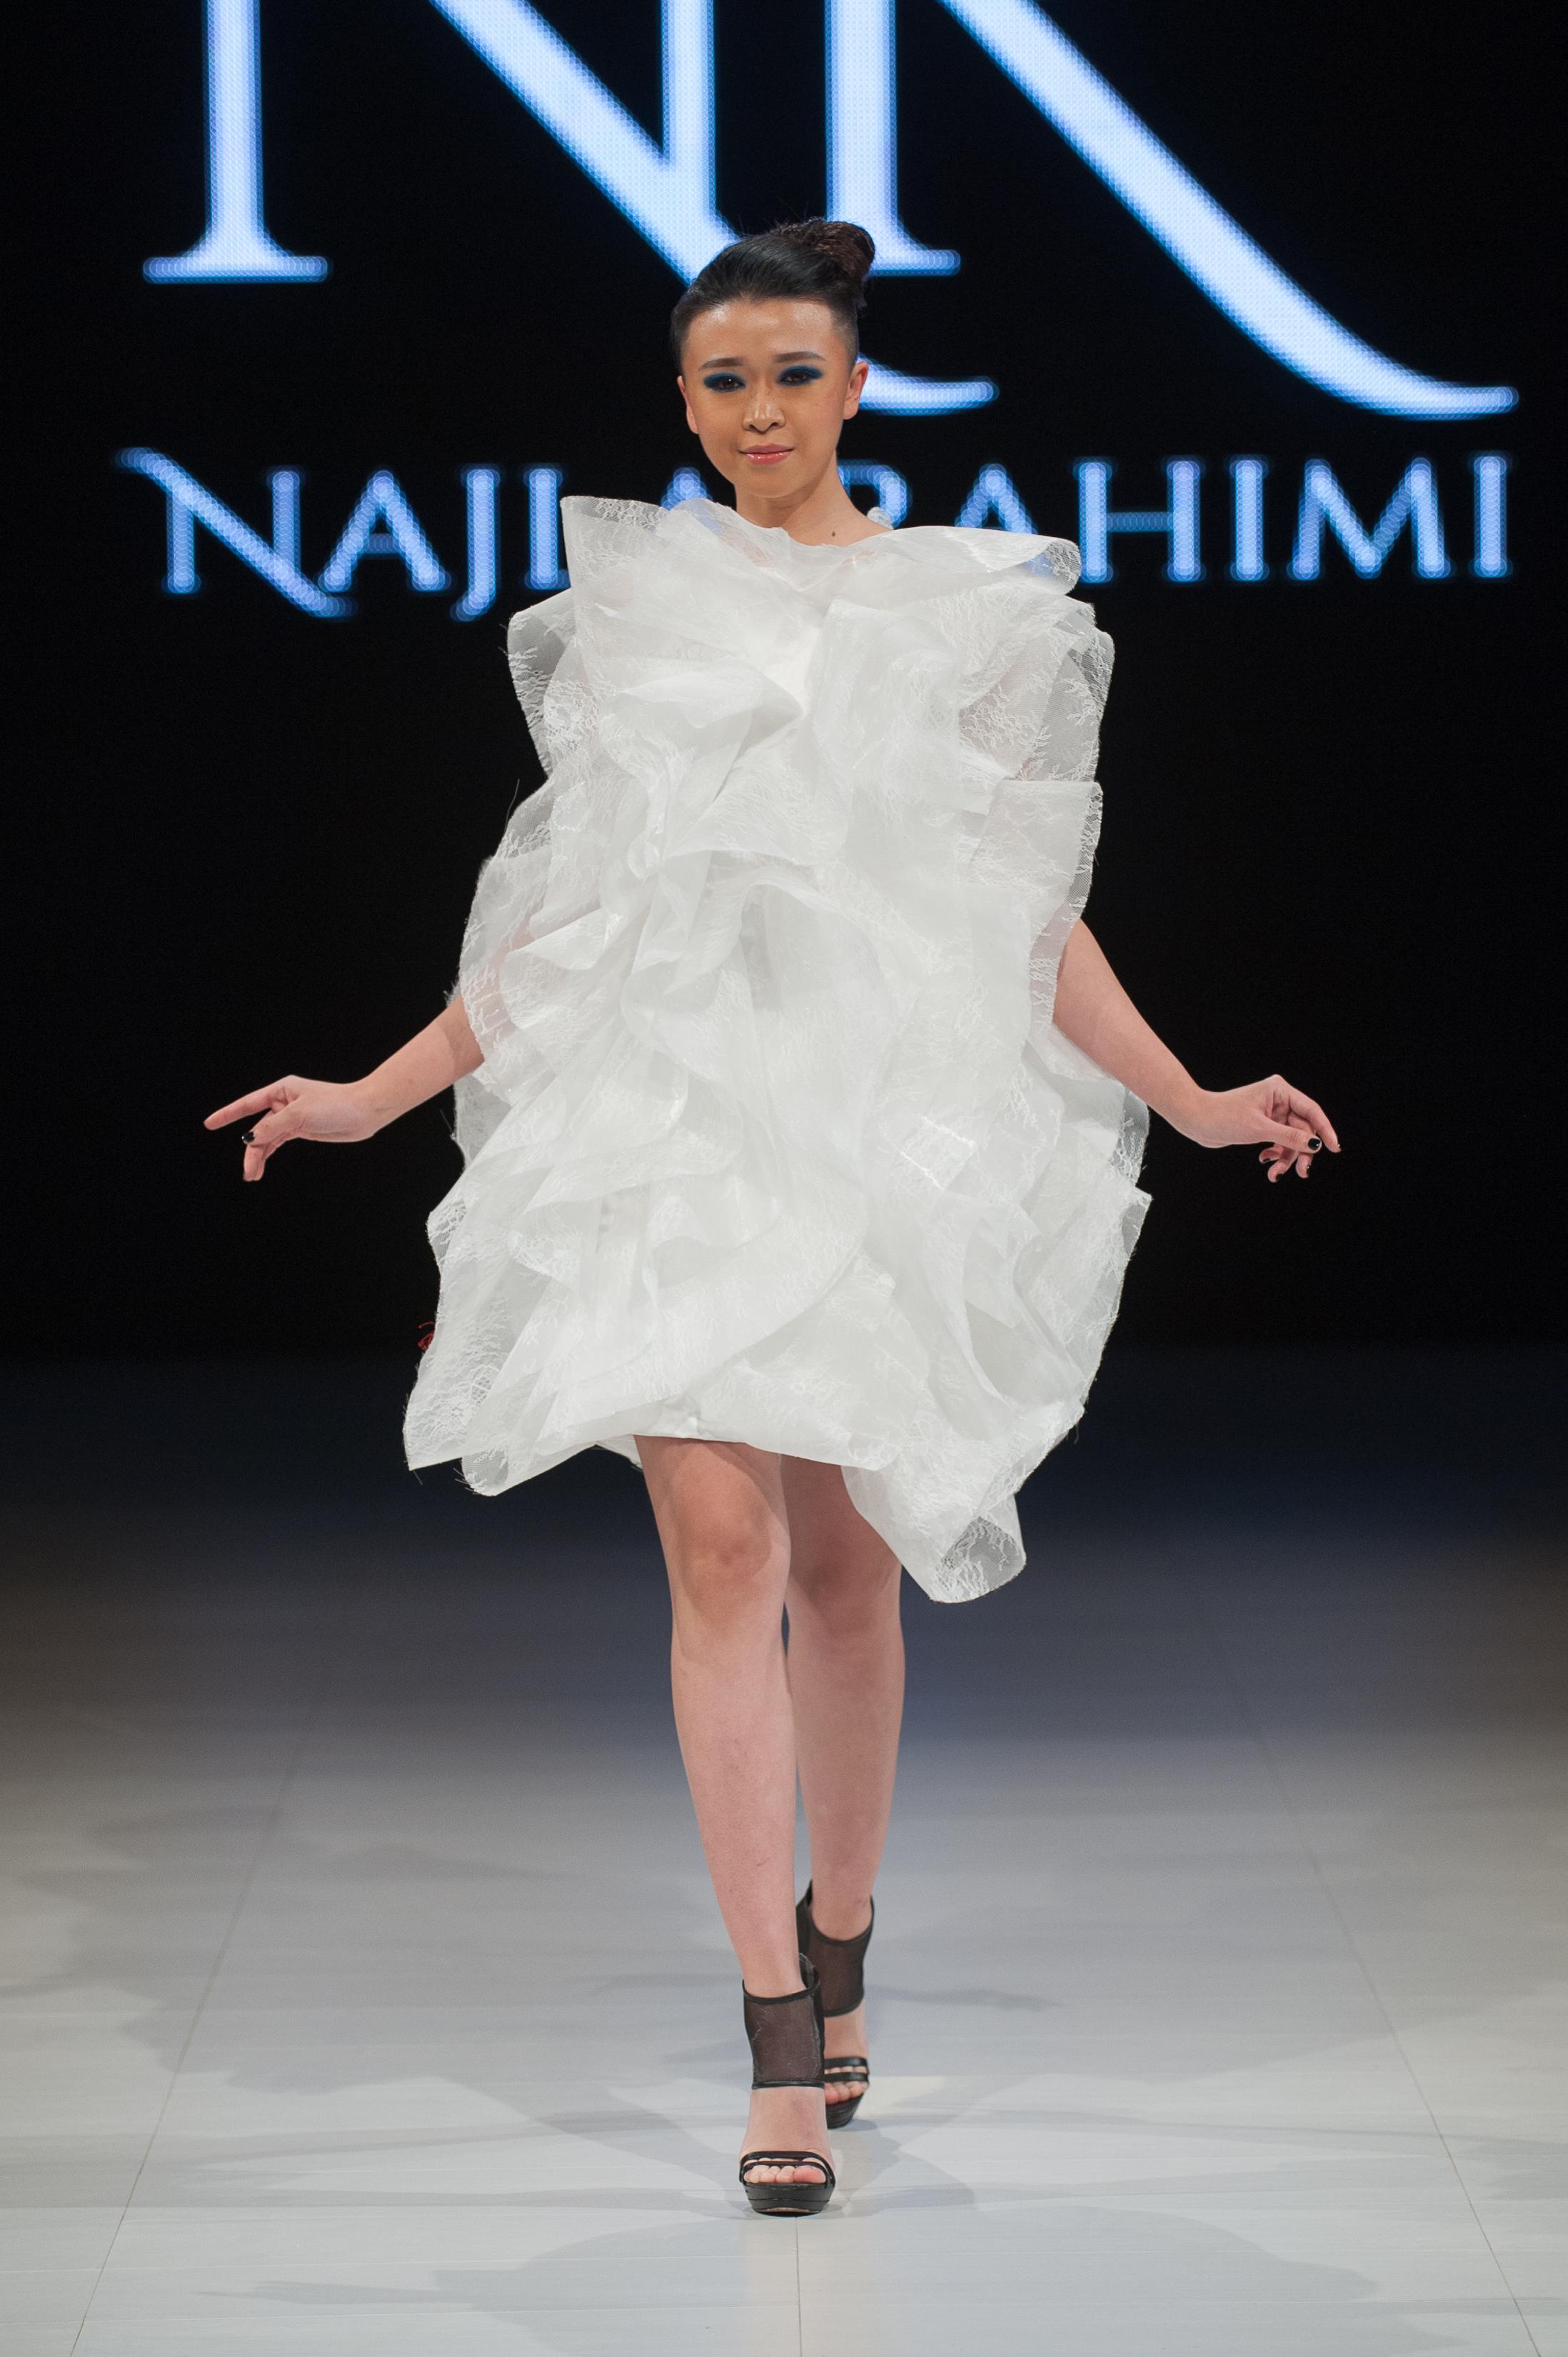 FAT2018-Day1-April17-Najla_Rahimi-Runway-Che_Rosales-LARAWAN-6114.jpg